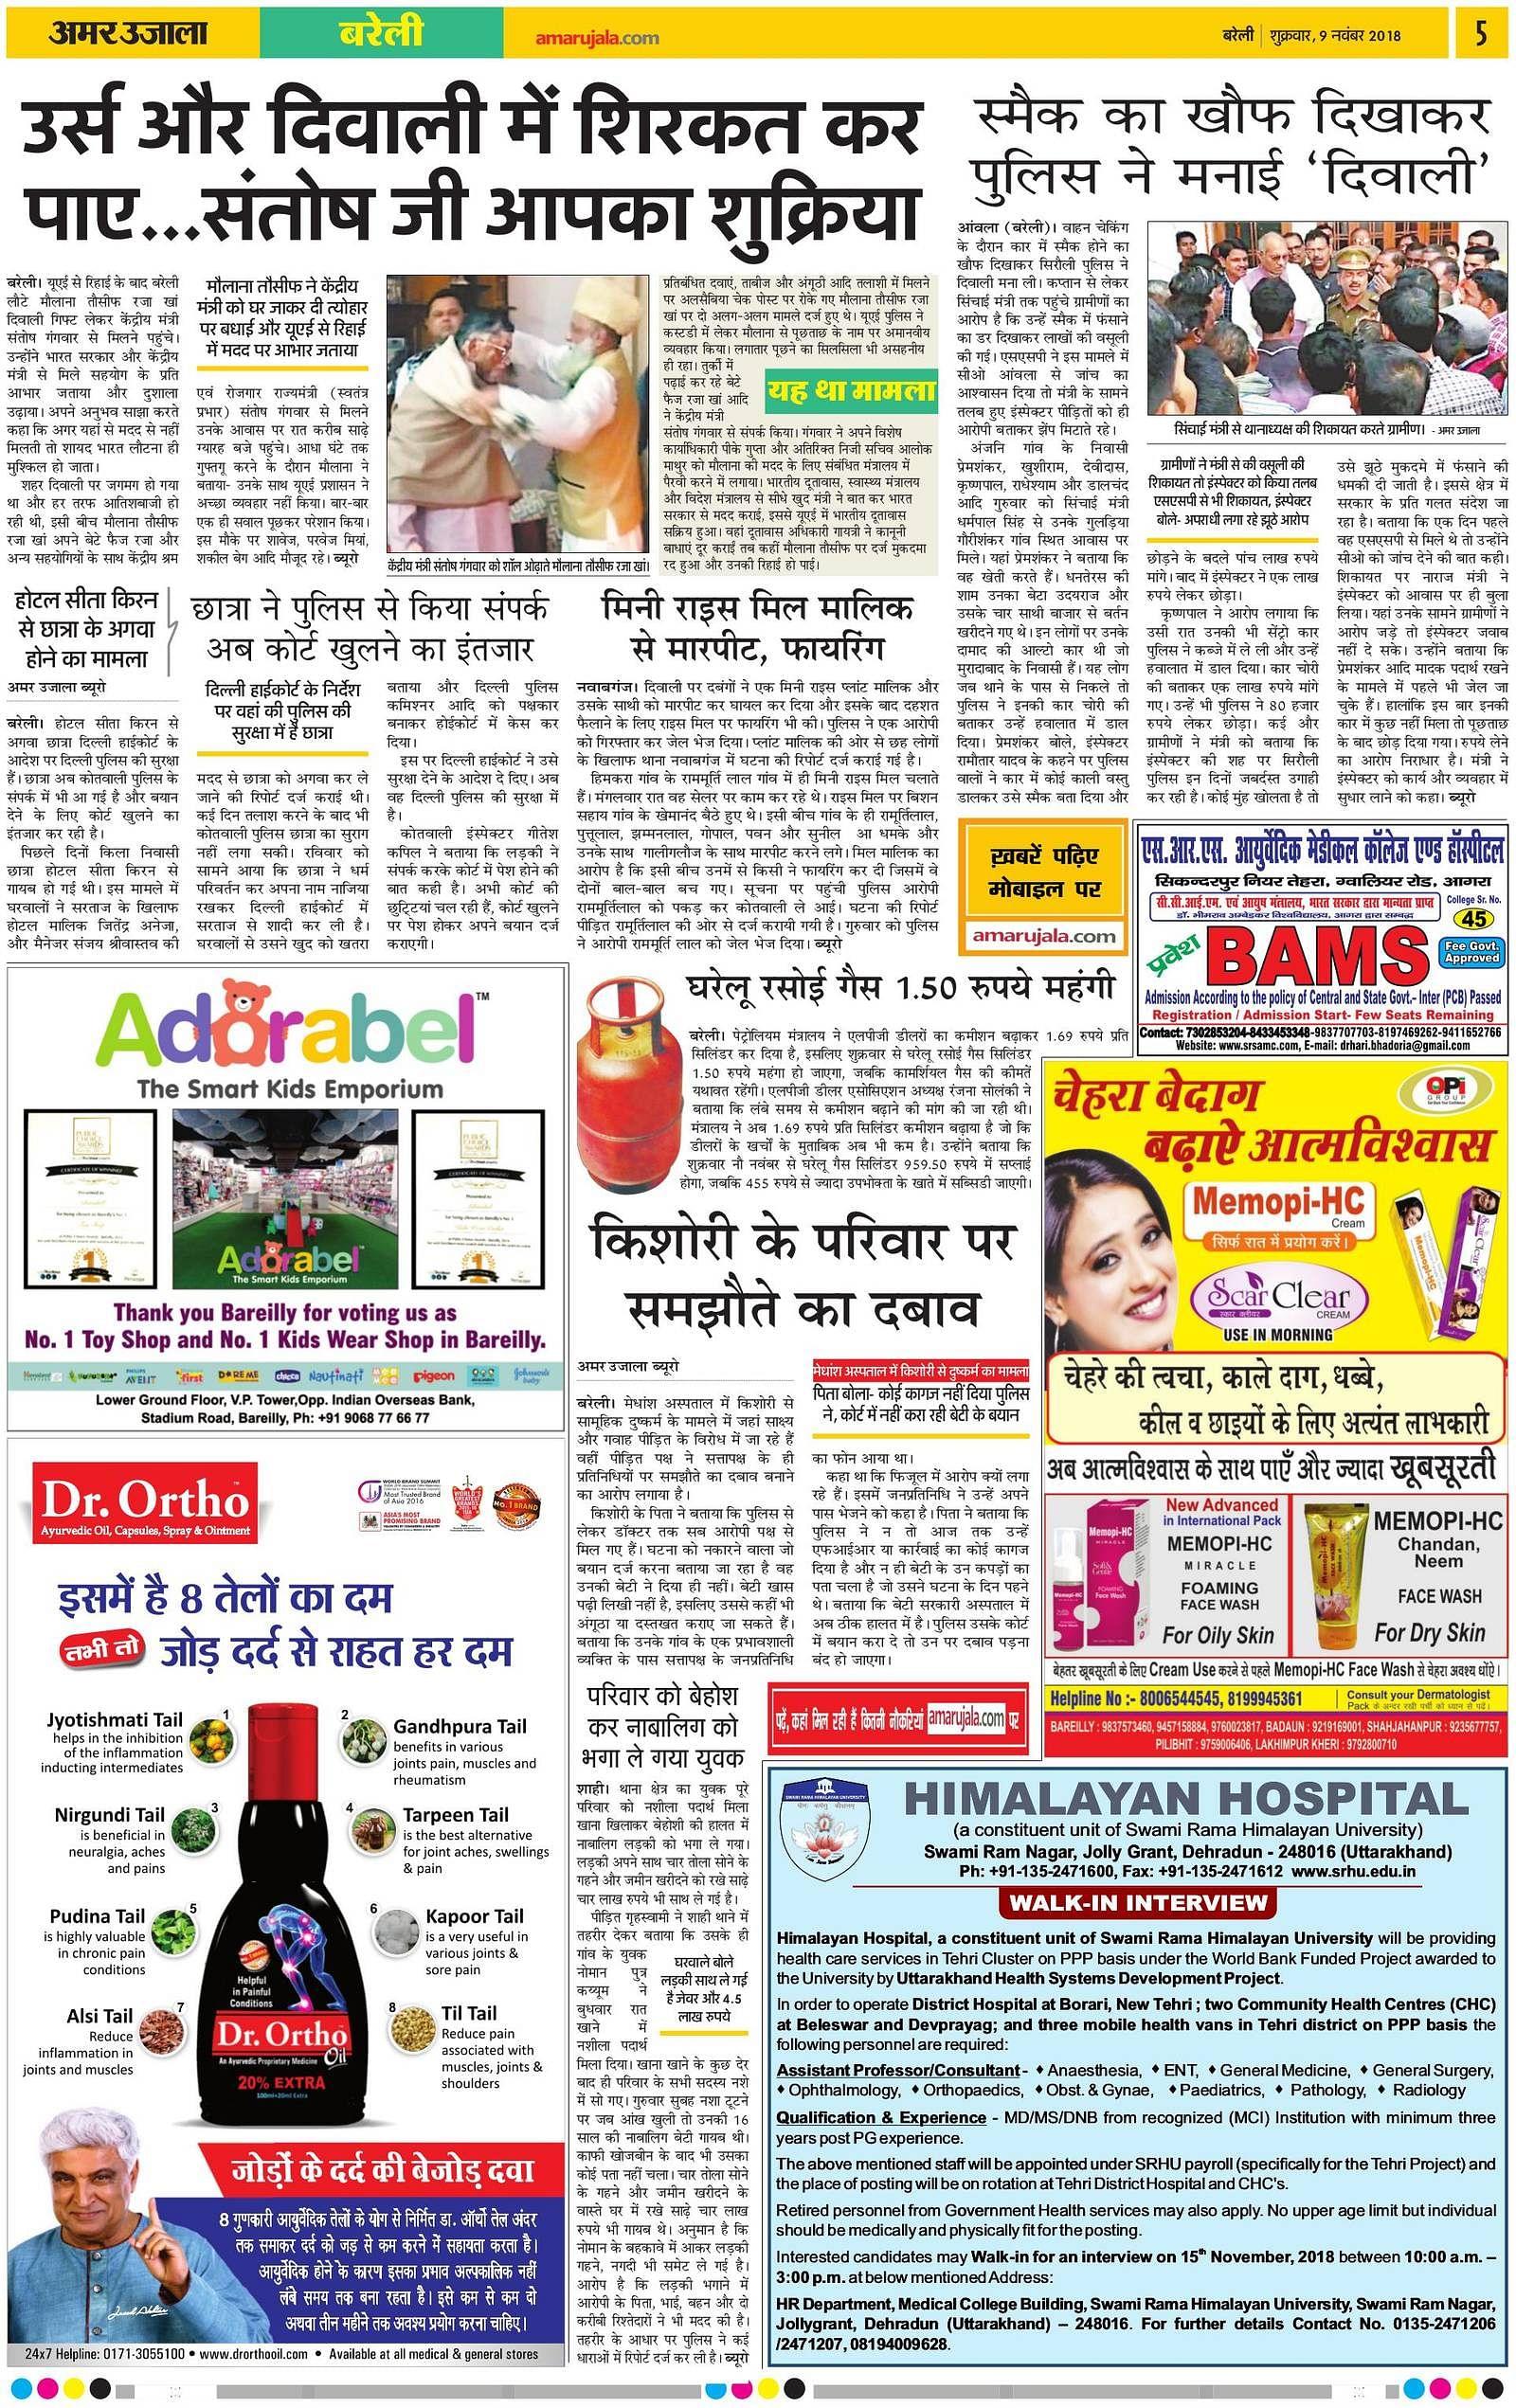 Bareilly india hindi news, bareilly india news in hindi.